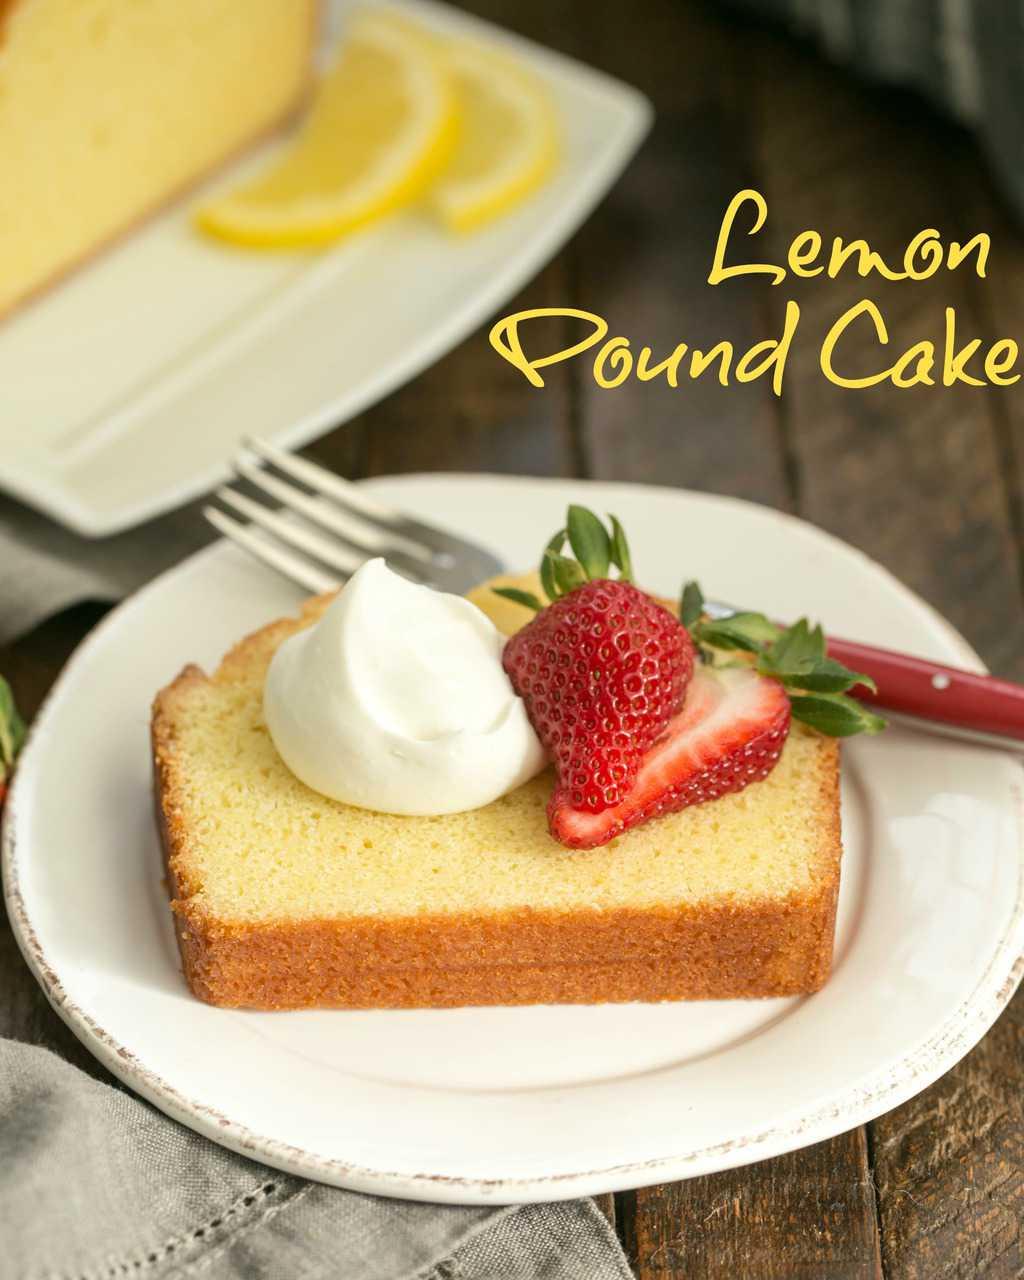 Glazed Lemon Pound Cake - served with whipped cream and berries for a delightful #citrus dessert #lemon #poundcake